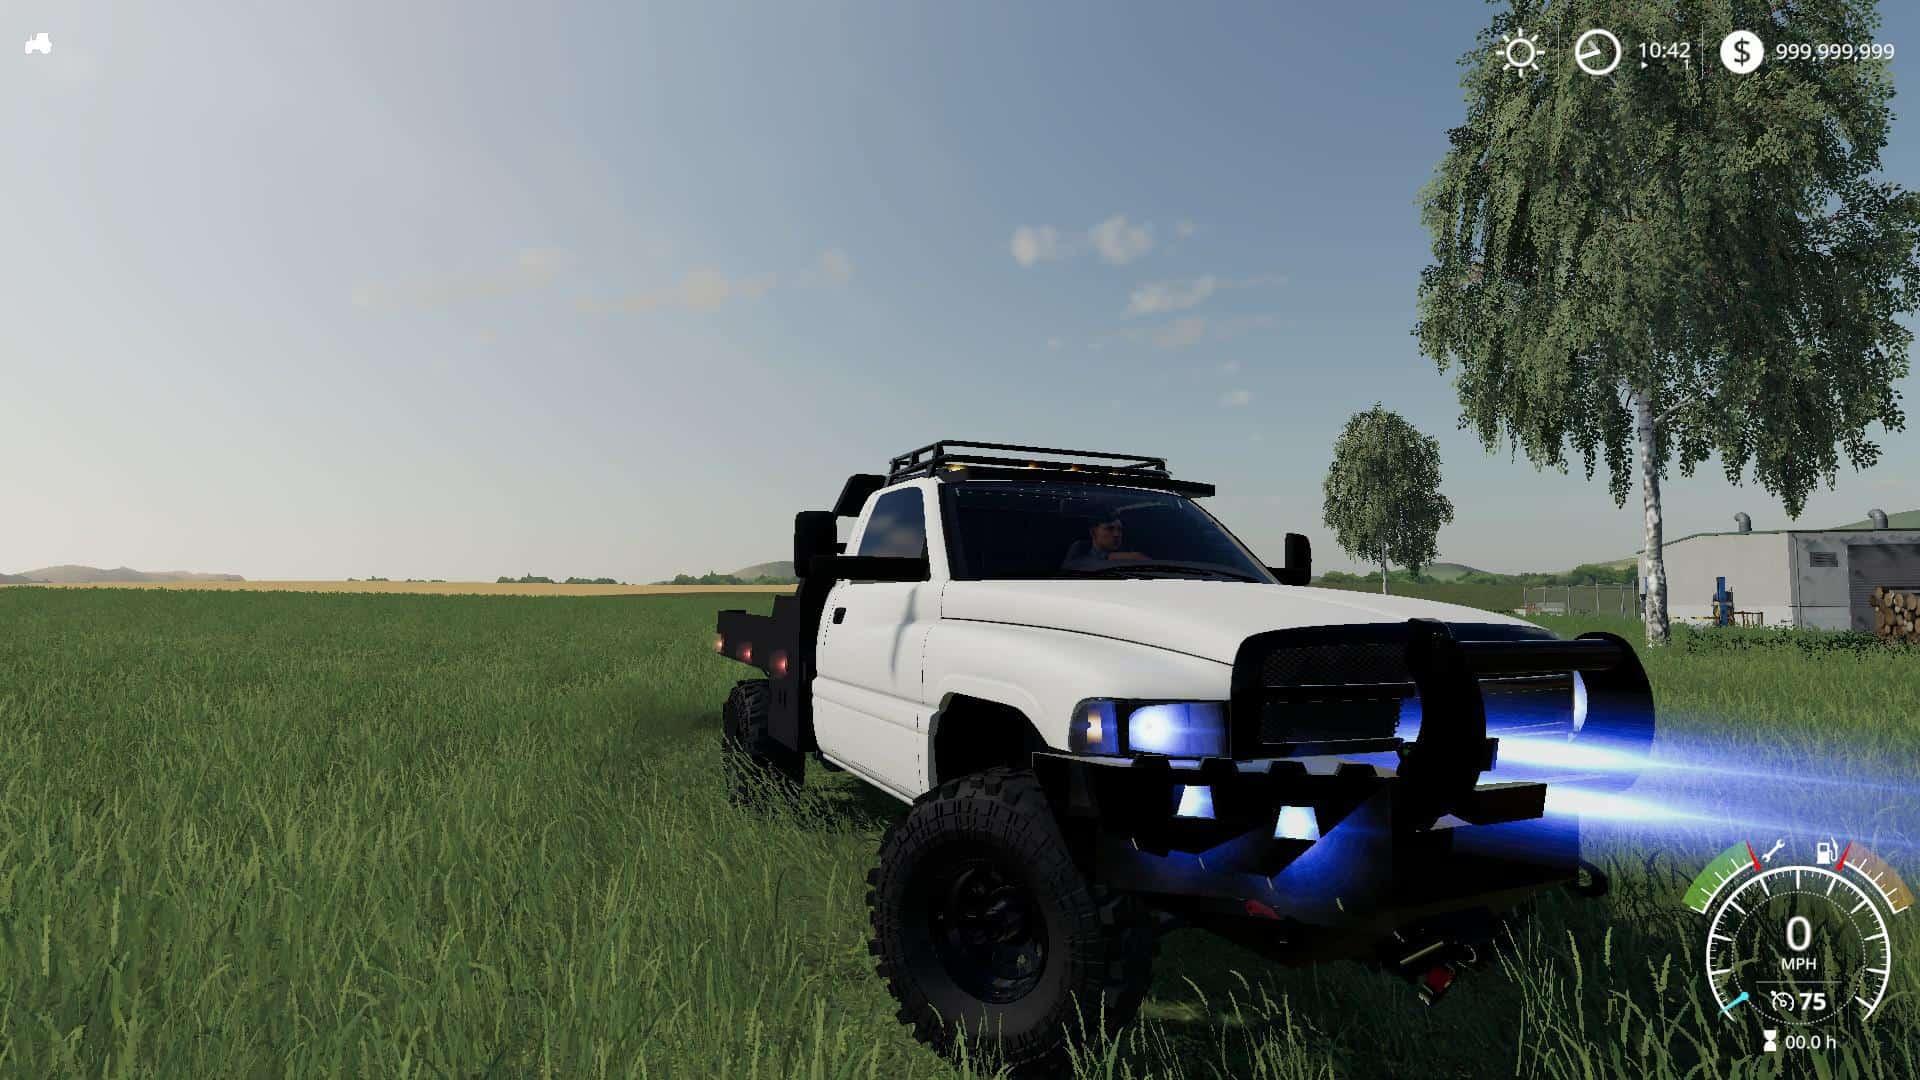 Second Gen Flatbed v1 0 0 0 Mod - Farming Simulator 19 Mod / FS19